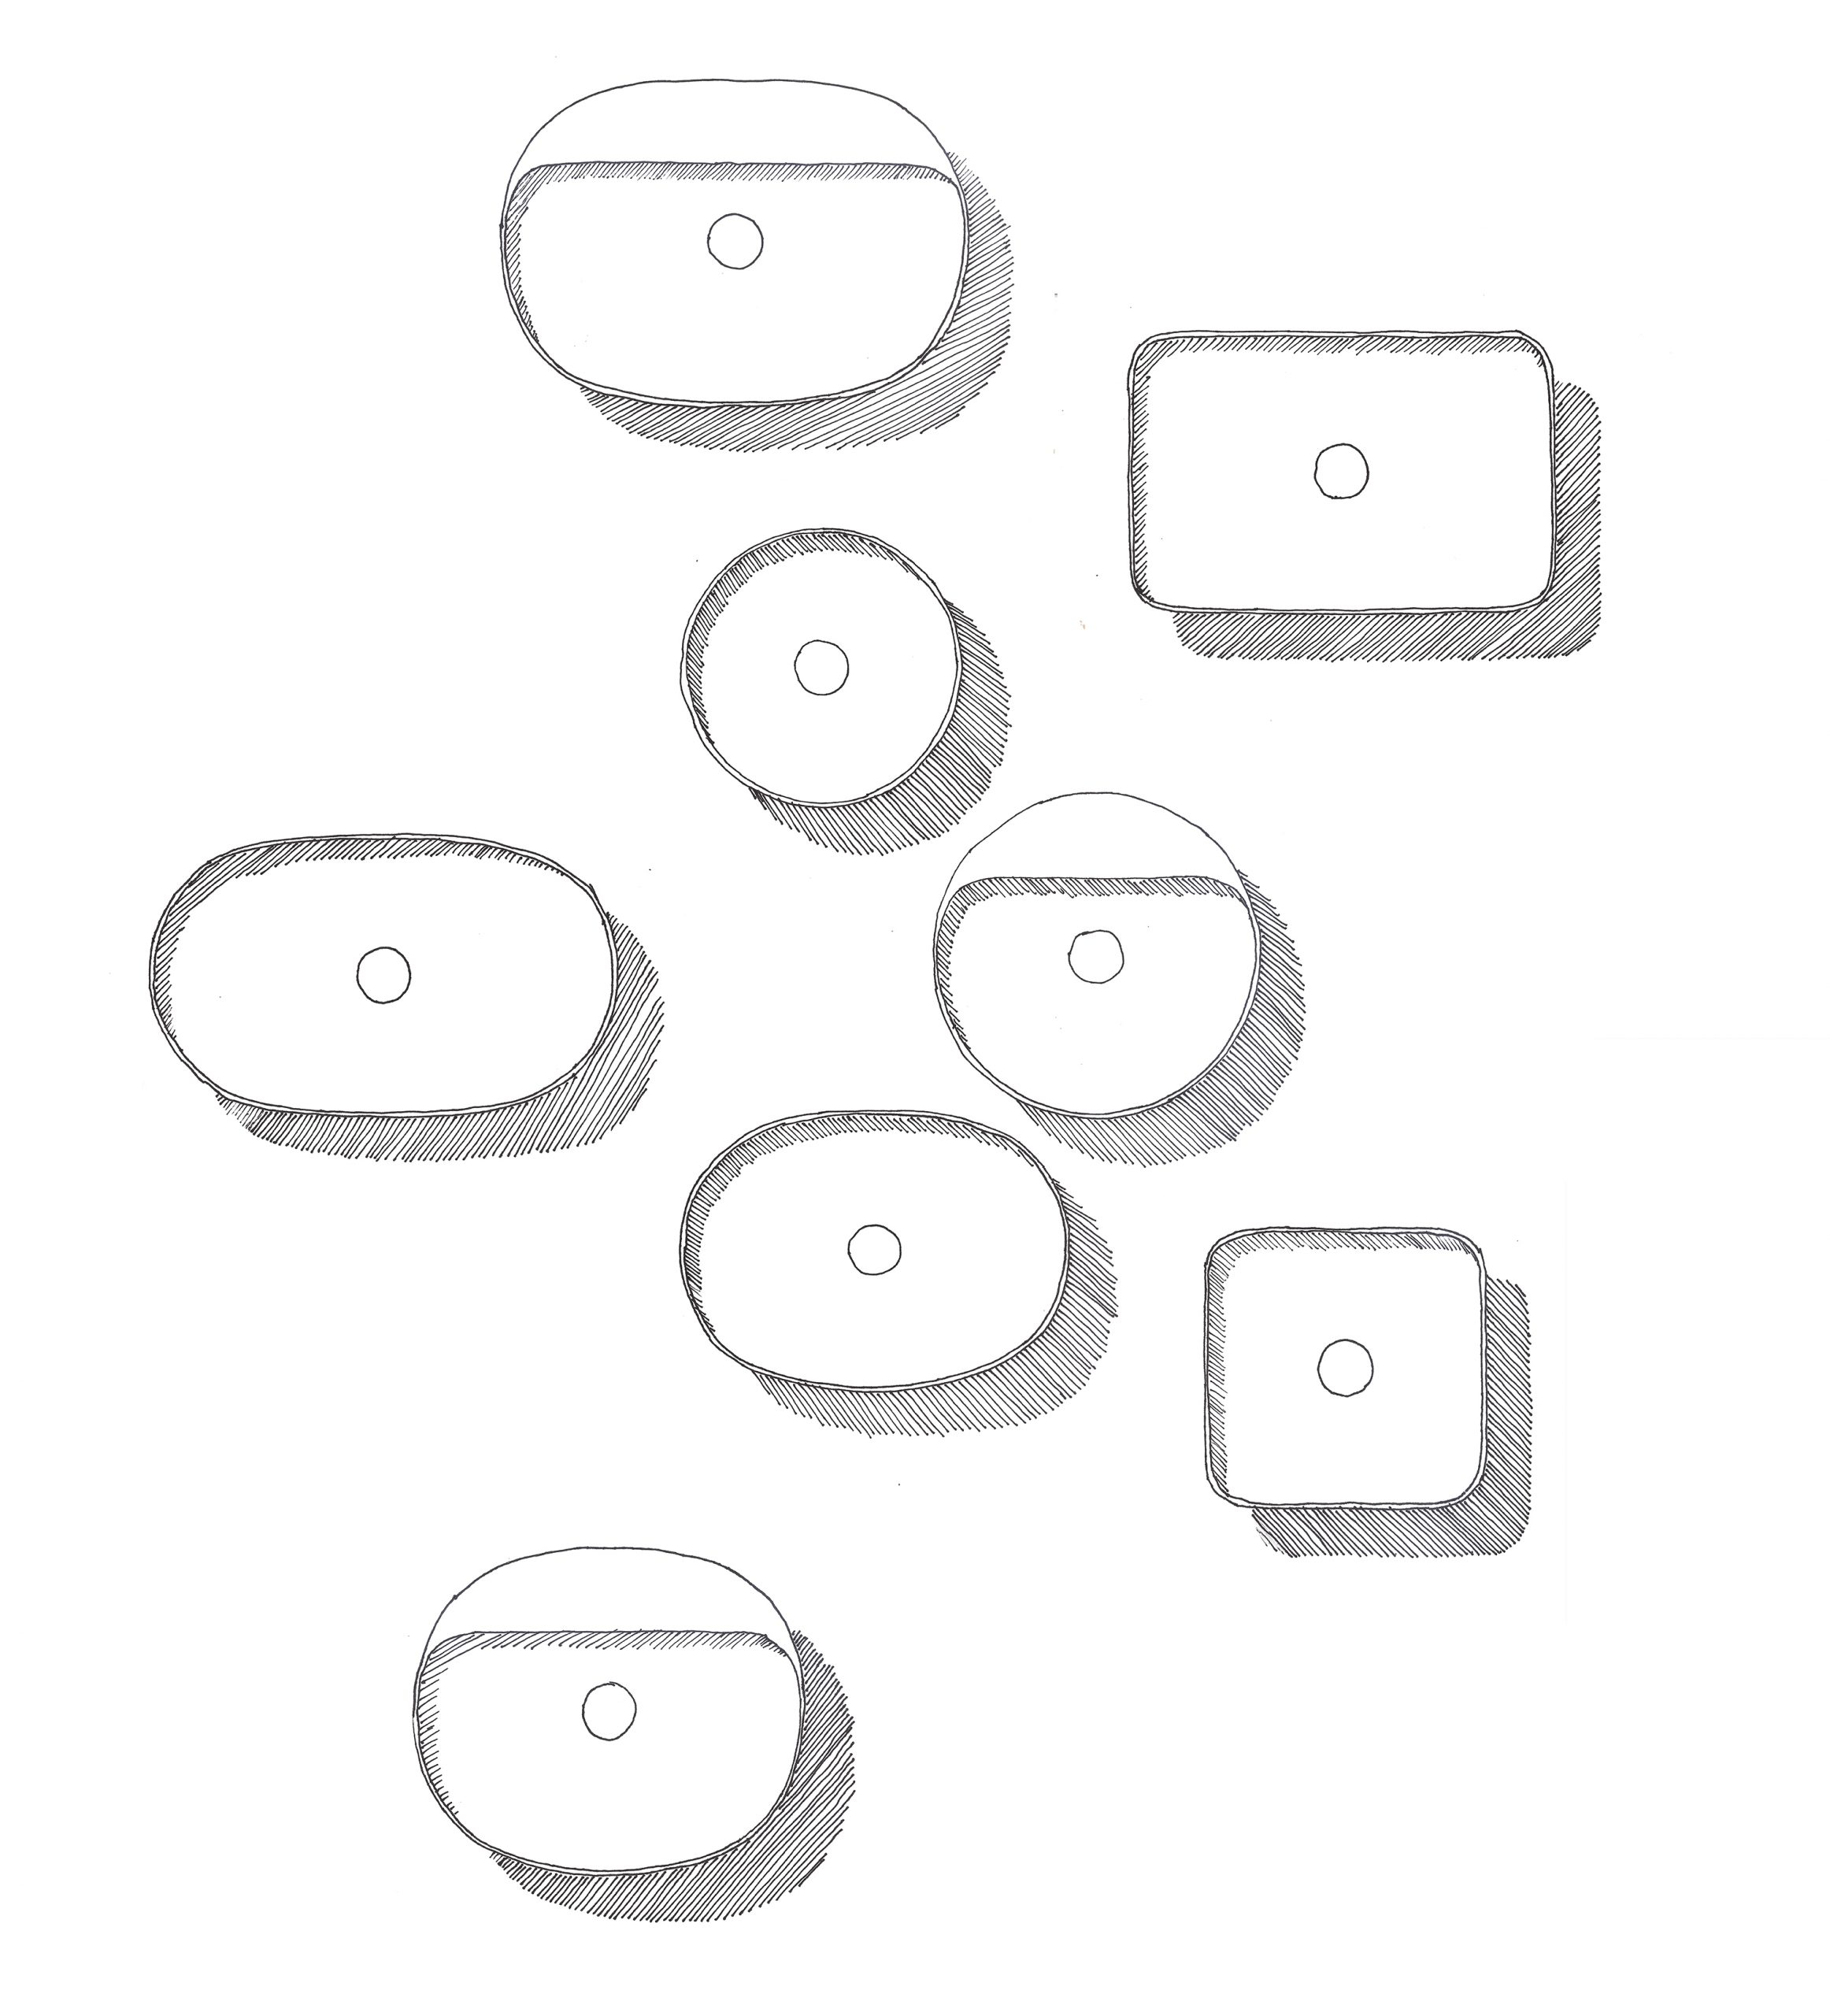 Sketch of top view of Variant washbasins designed by Debiasi Sandri for RAK Ceramics